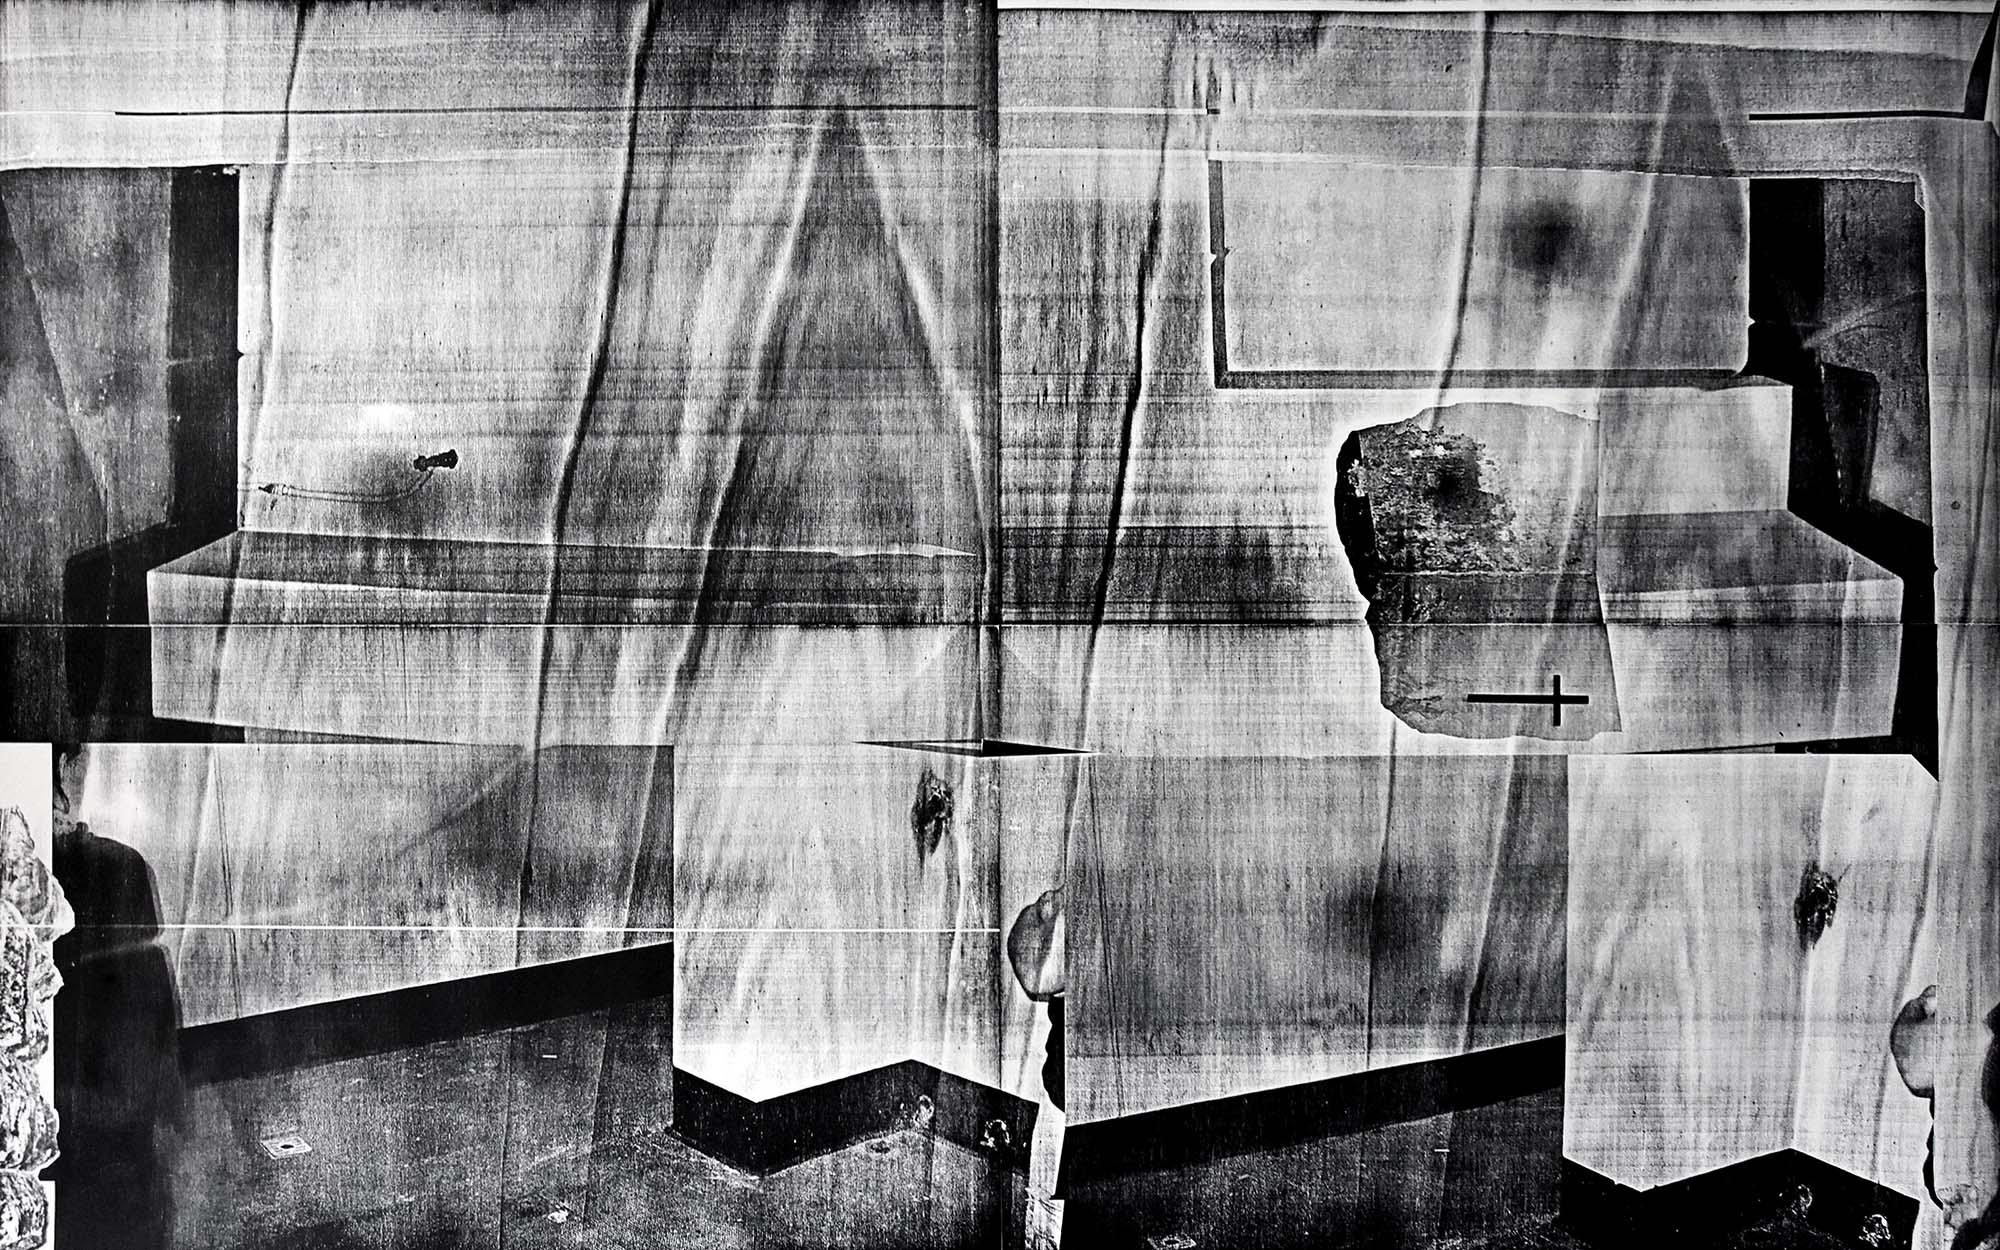 Pappel artwork paper woodcut Stasi execution site Stasi Hinrichtungsstätte Leipzig DDR